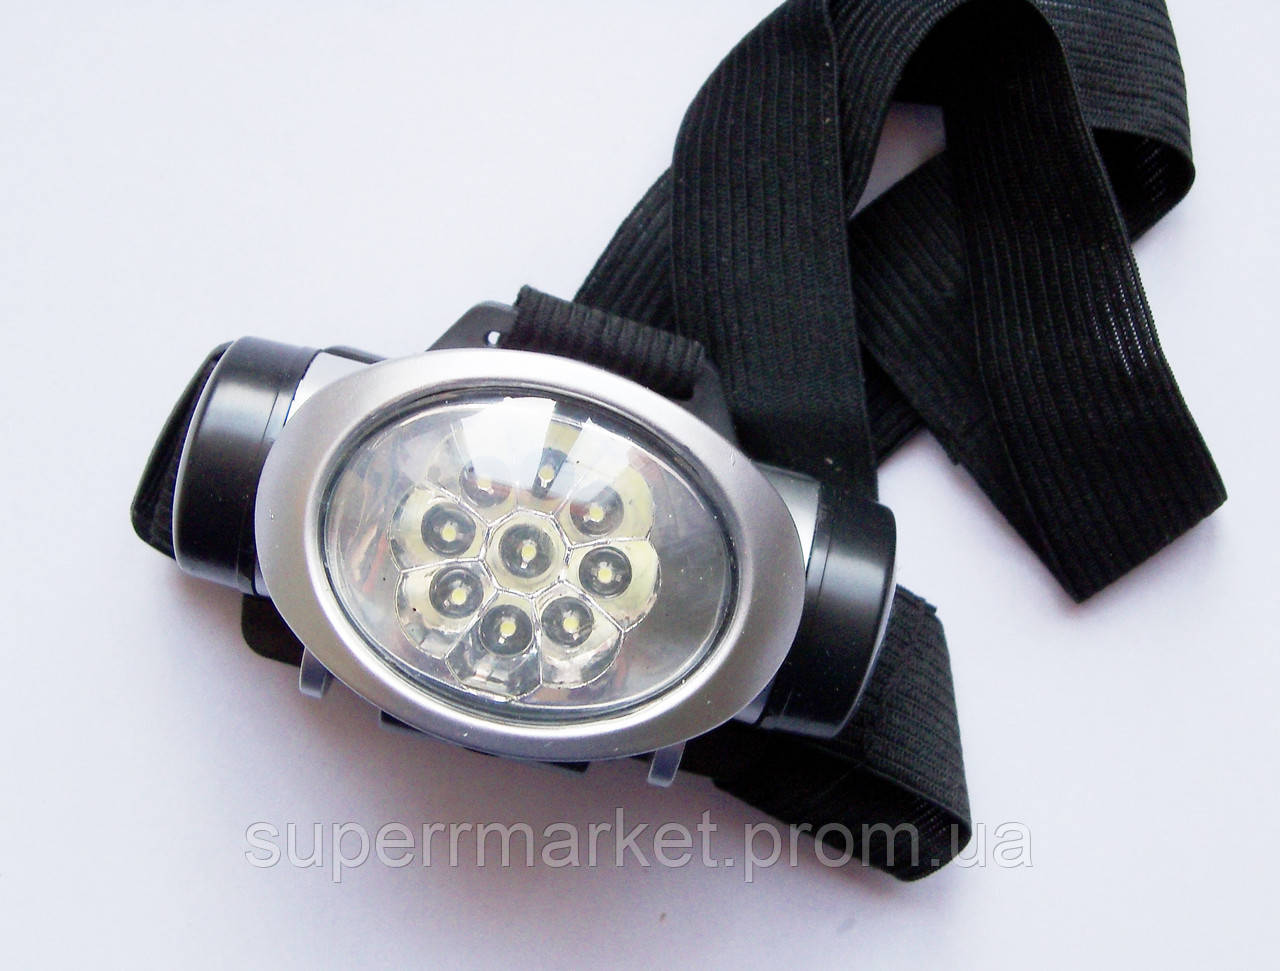 Налобный фонарь Bailong BL-603-9c